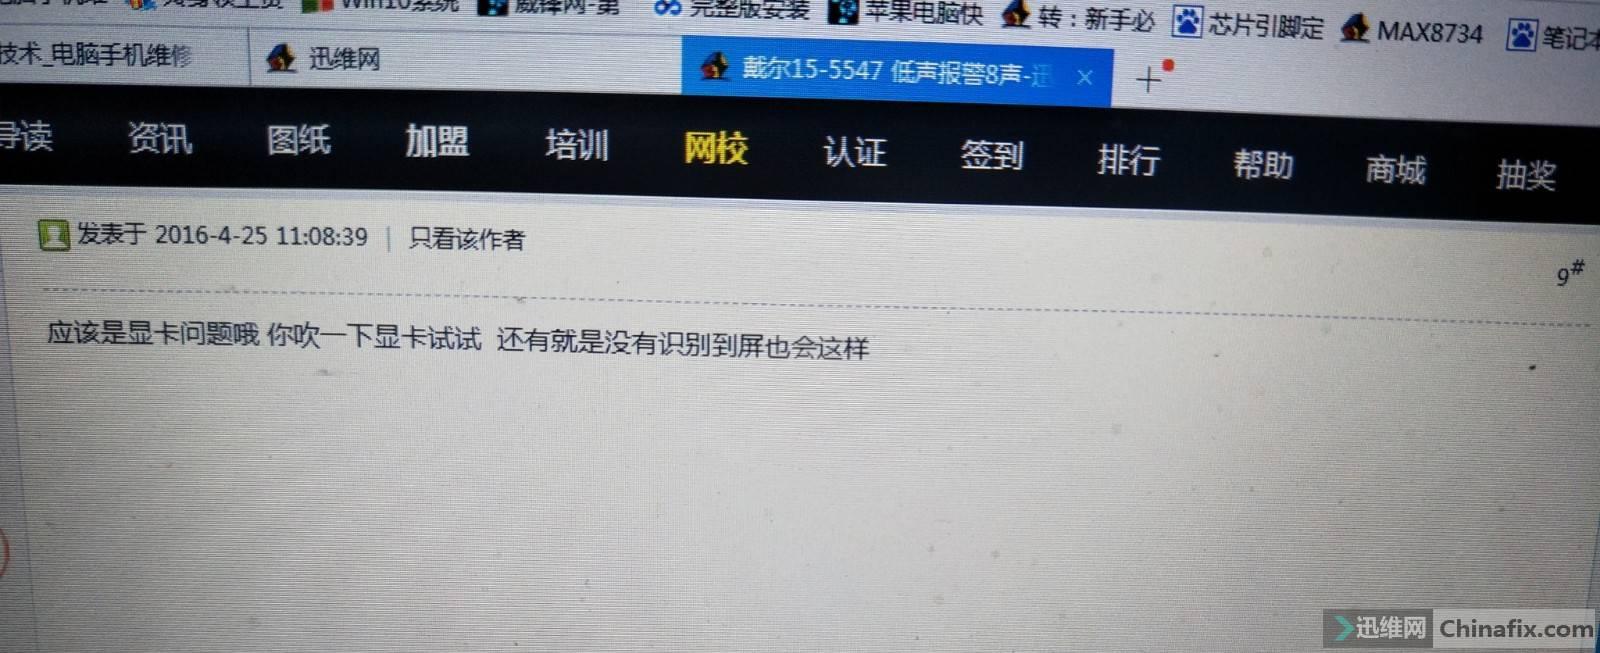 IMG20190910144841_看图王.jpg